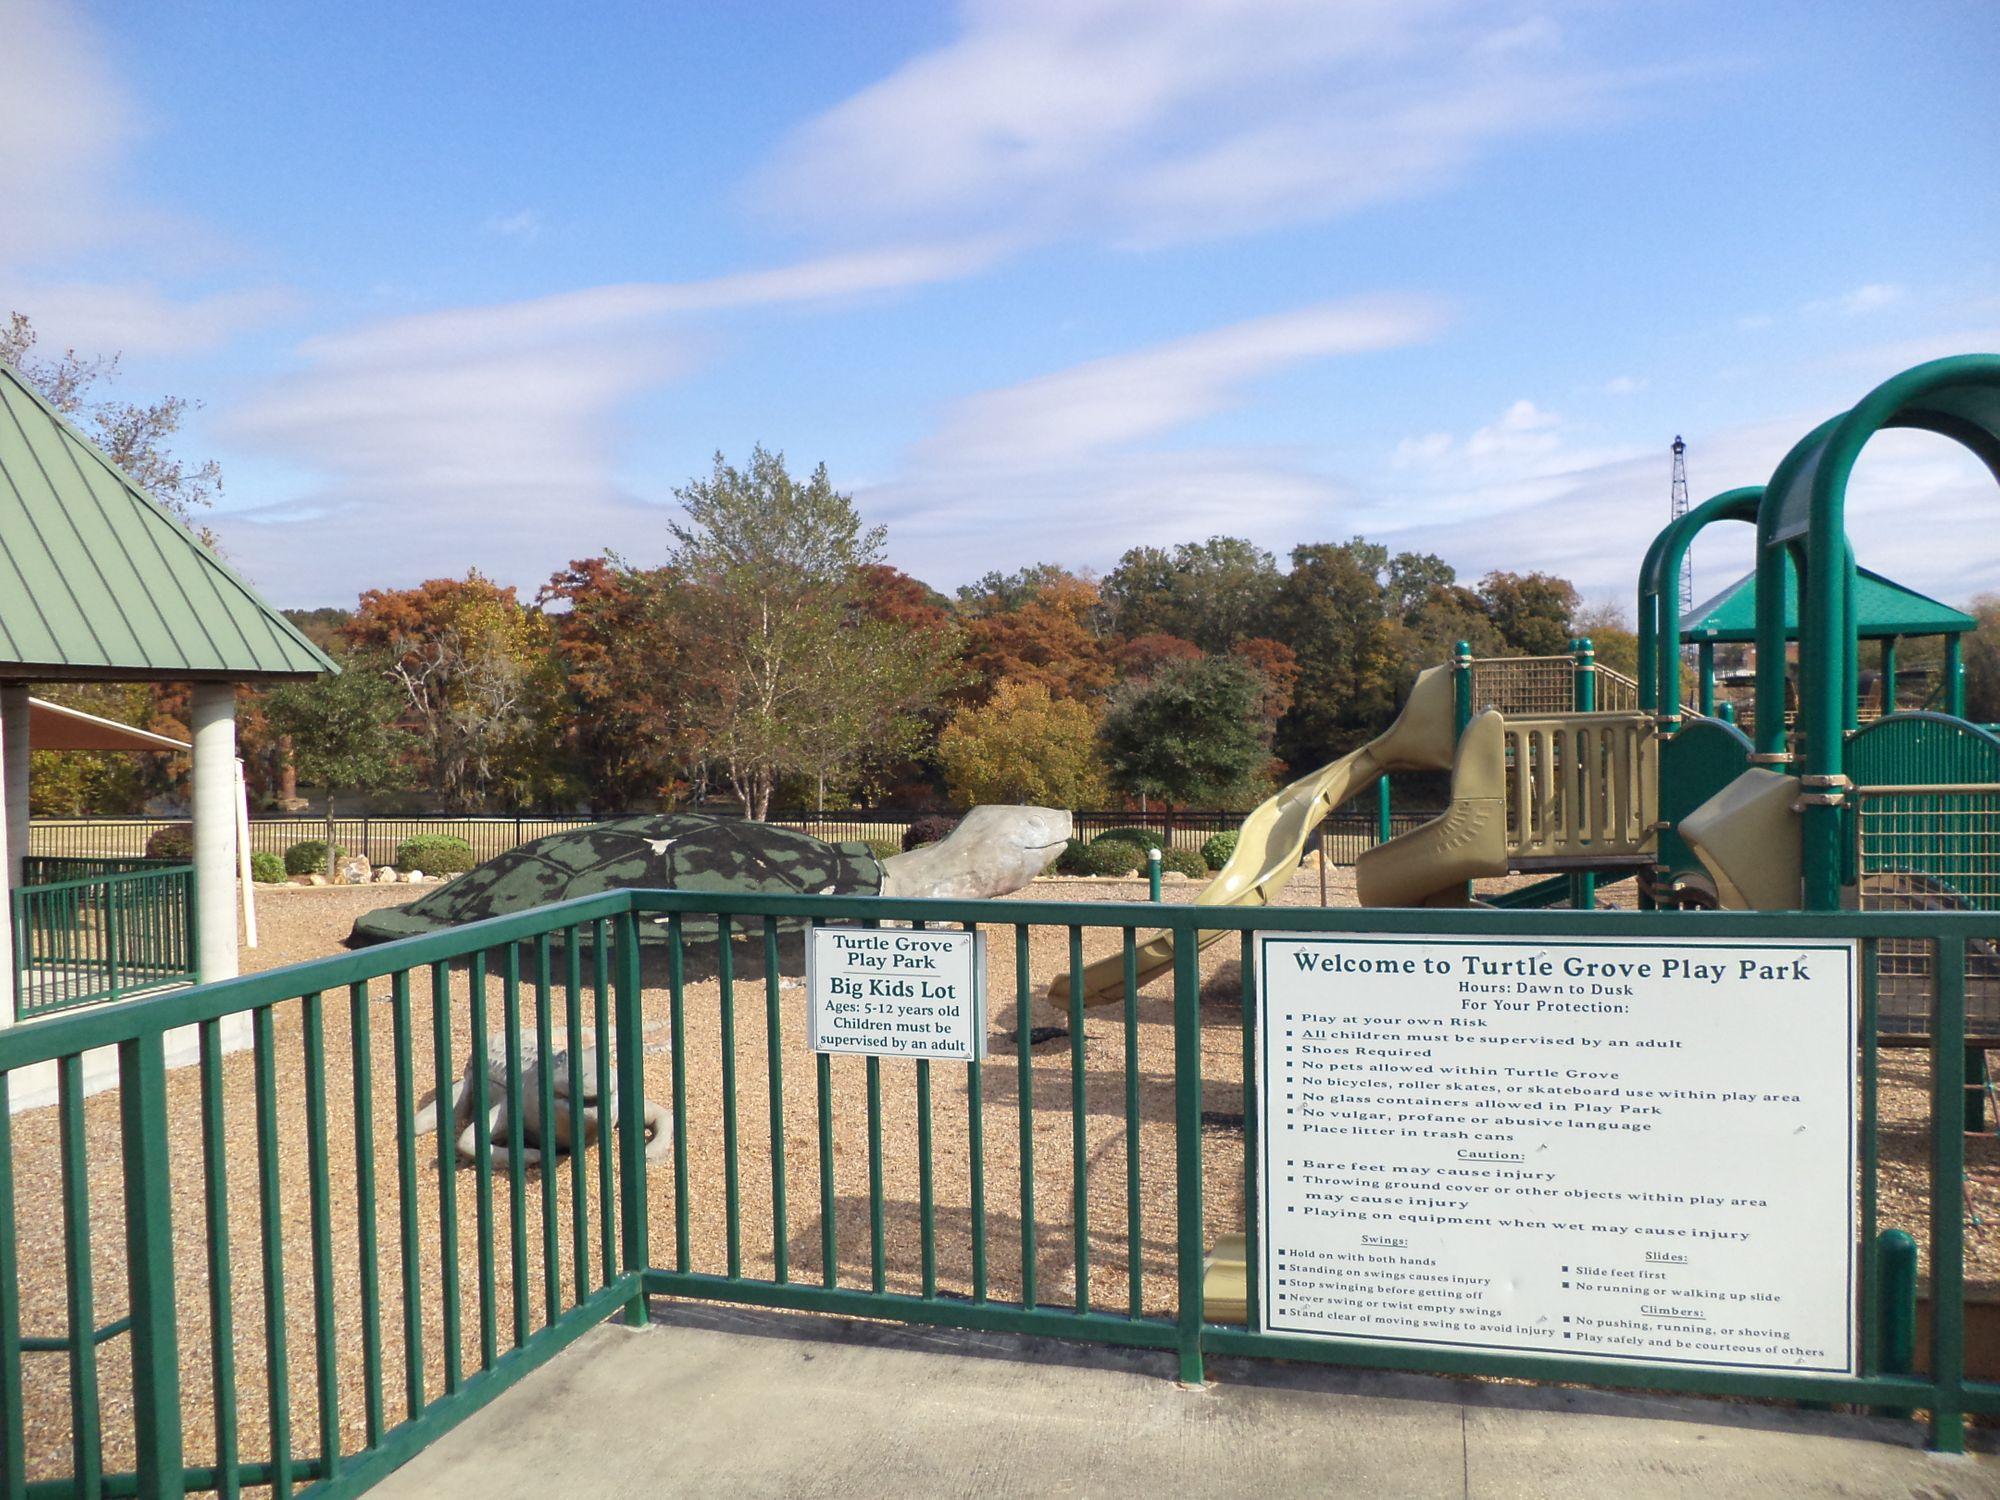 Turtle Grove Park